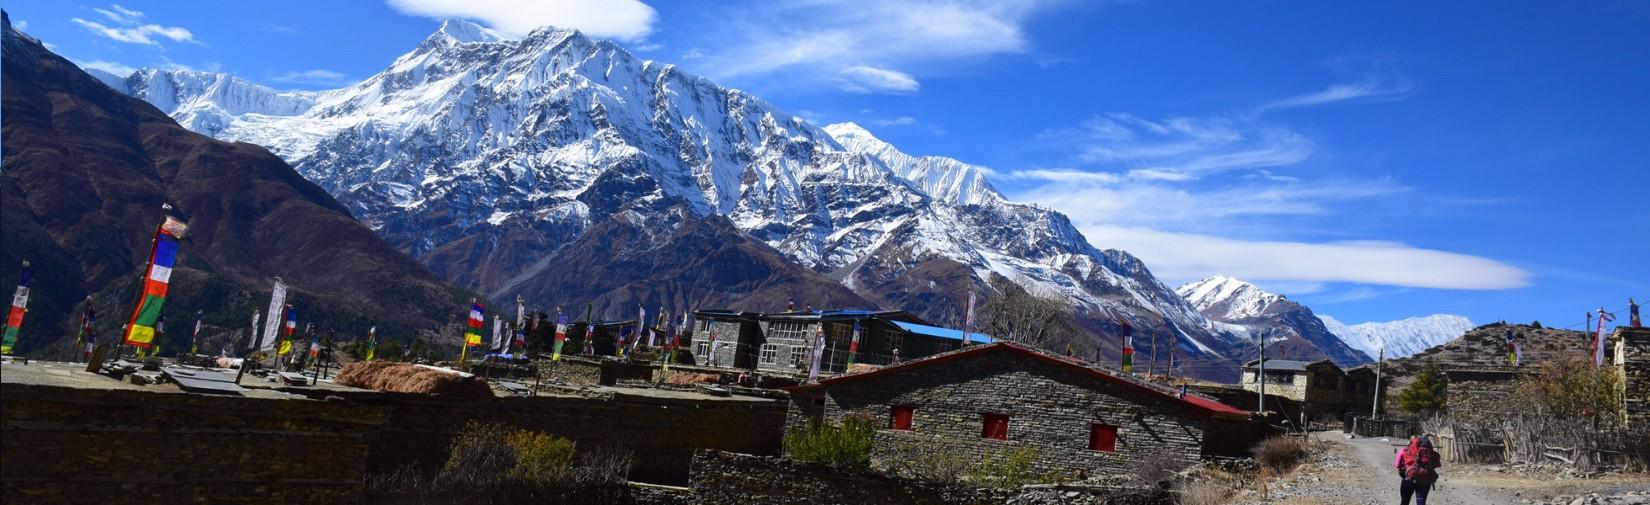 Ngawal-village-annapurna-circuit-trek-nepal